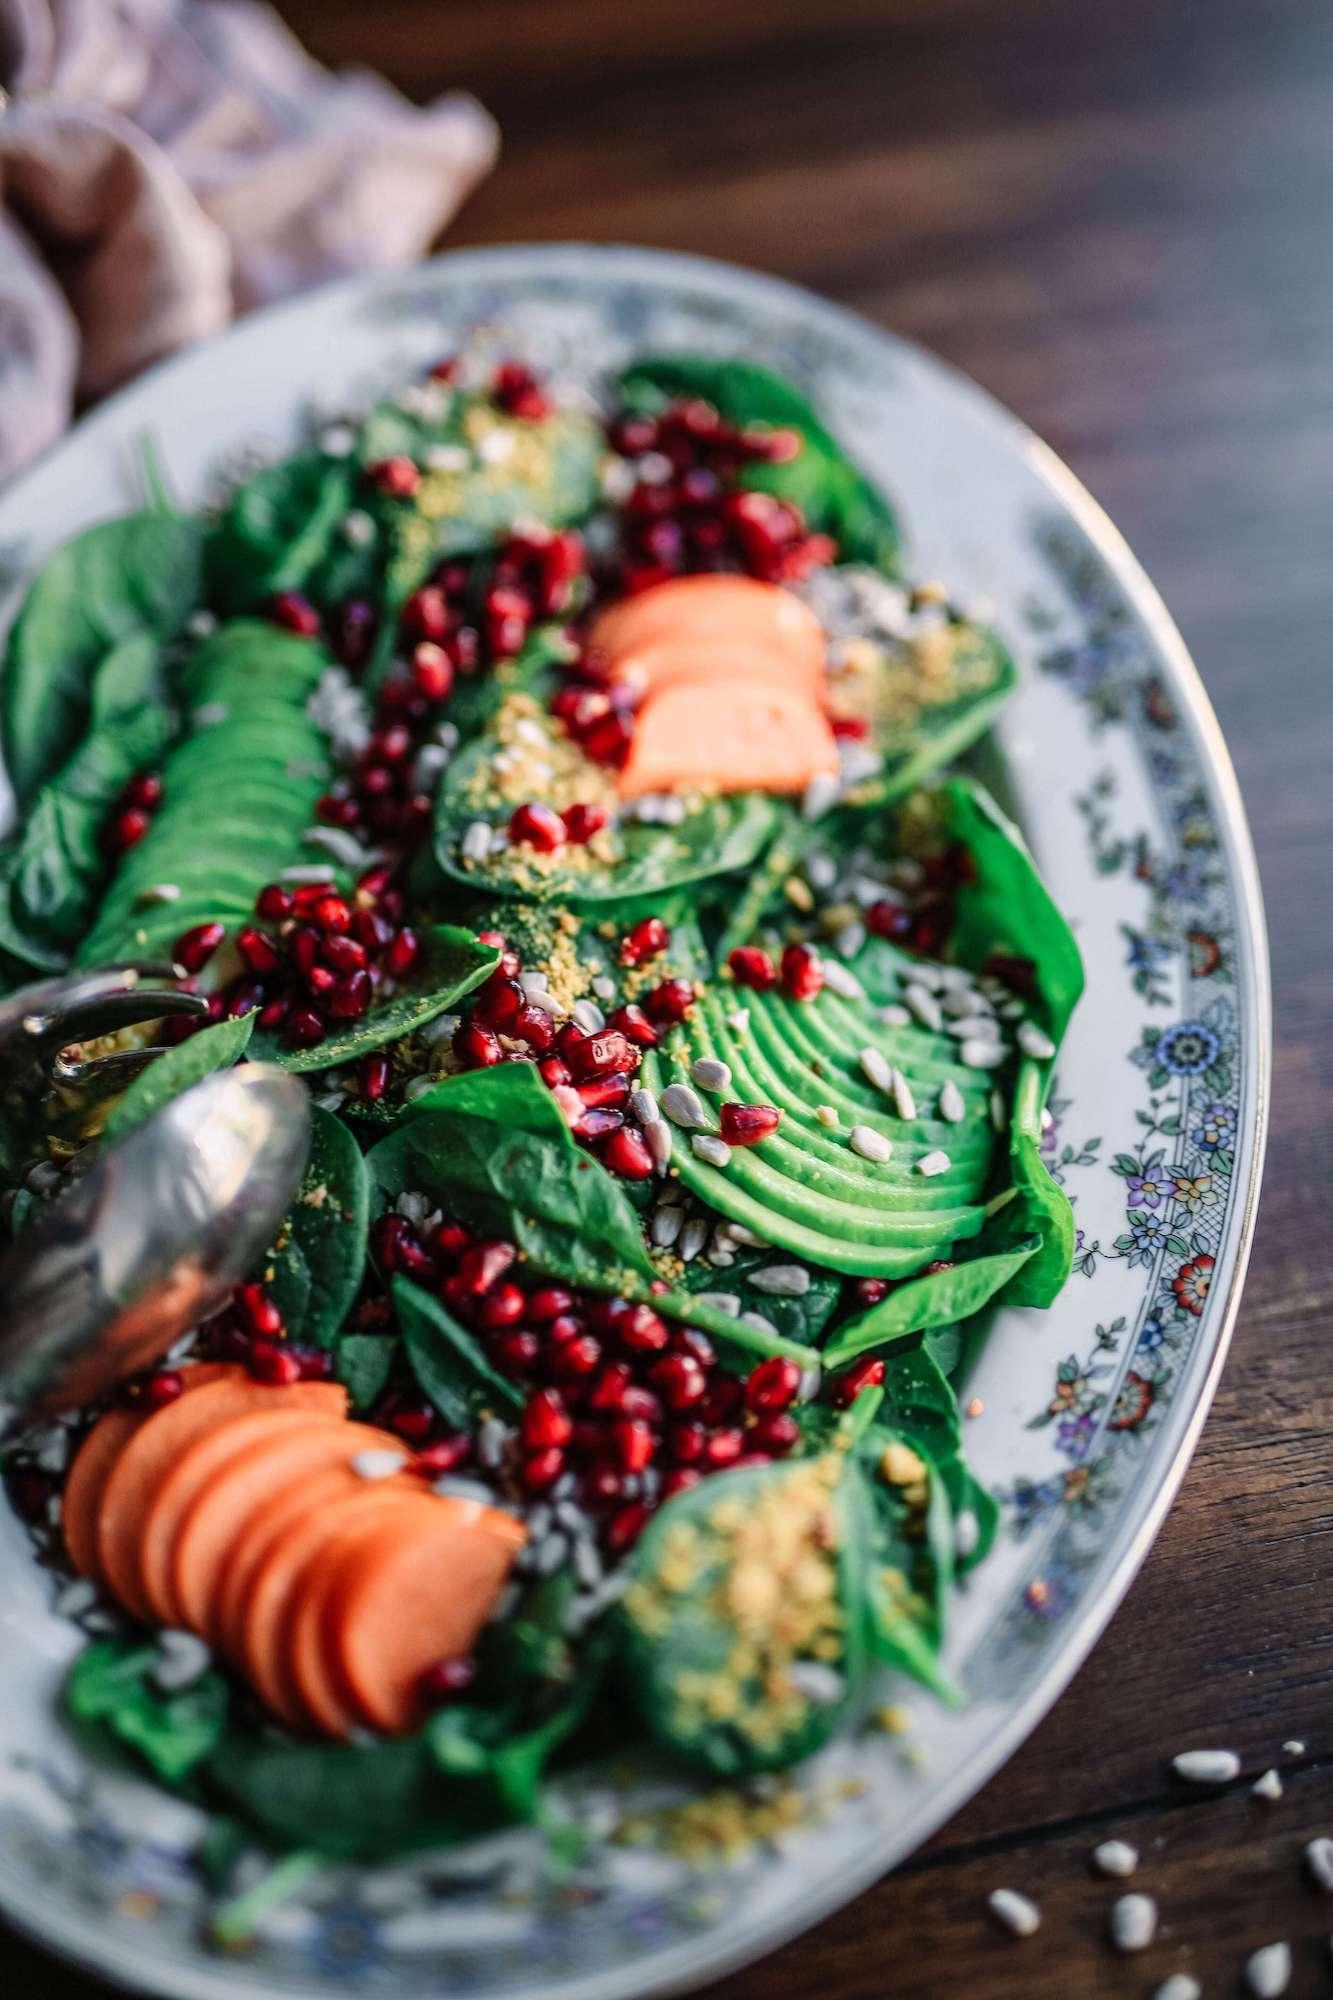 http://contao.lifefood.eu/tl_files/data/en/Blog/2018/Raw food in winter | part II/Raw food in winter 2.jpg